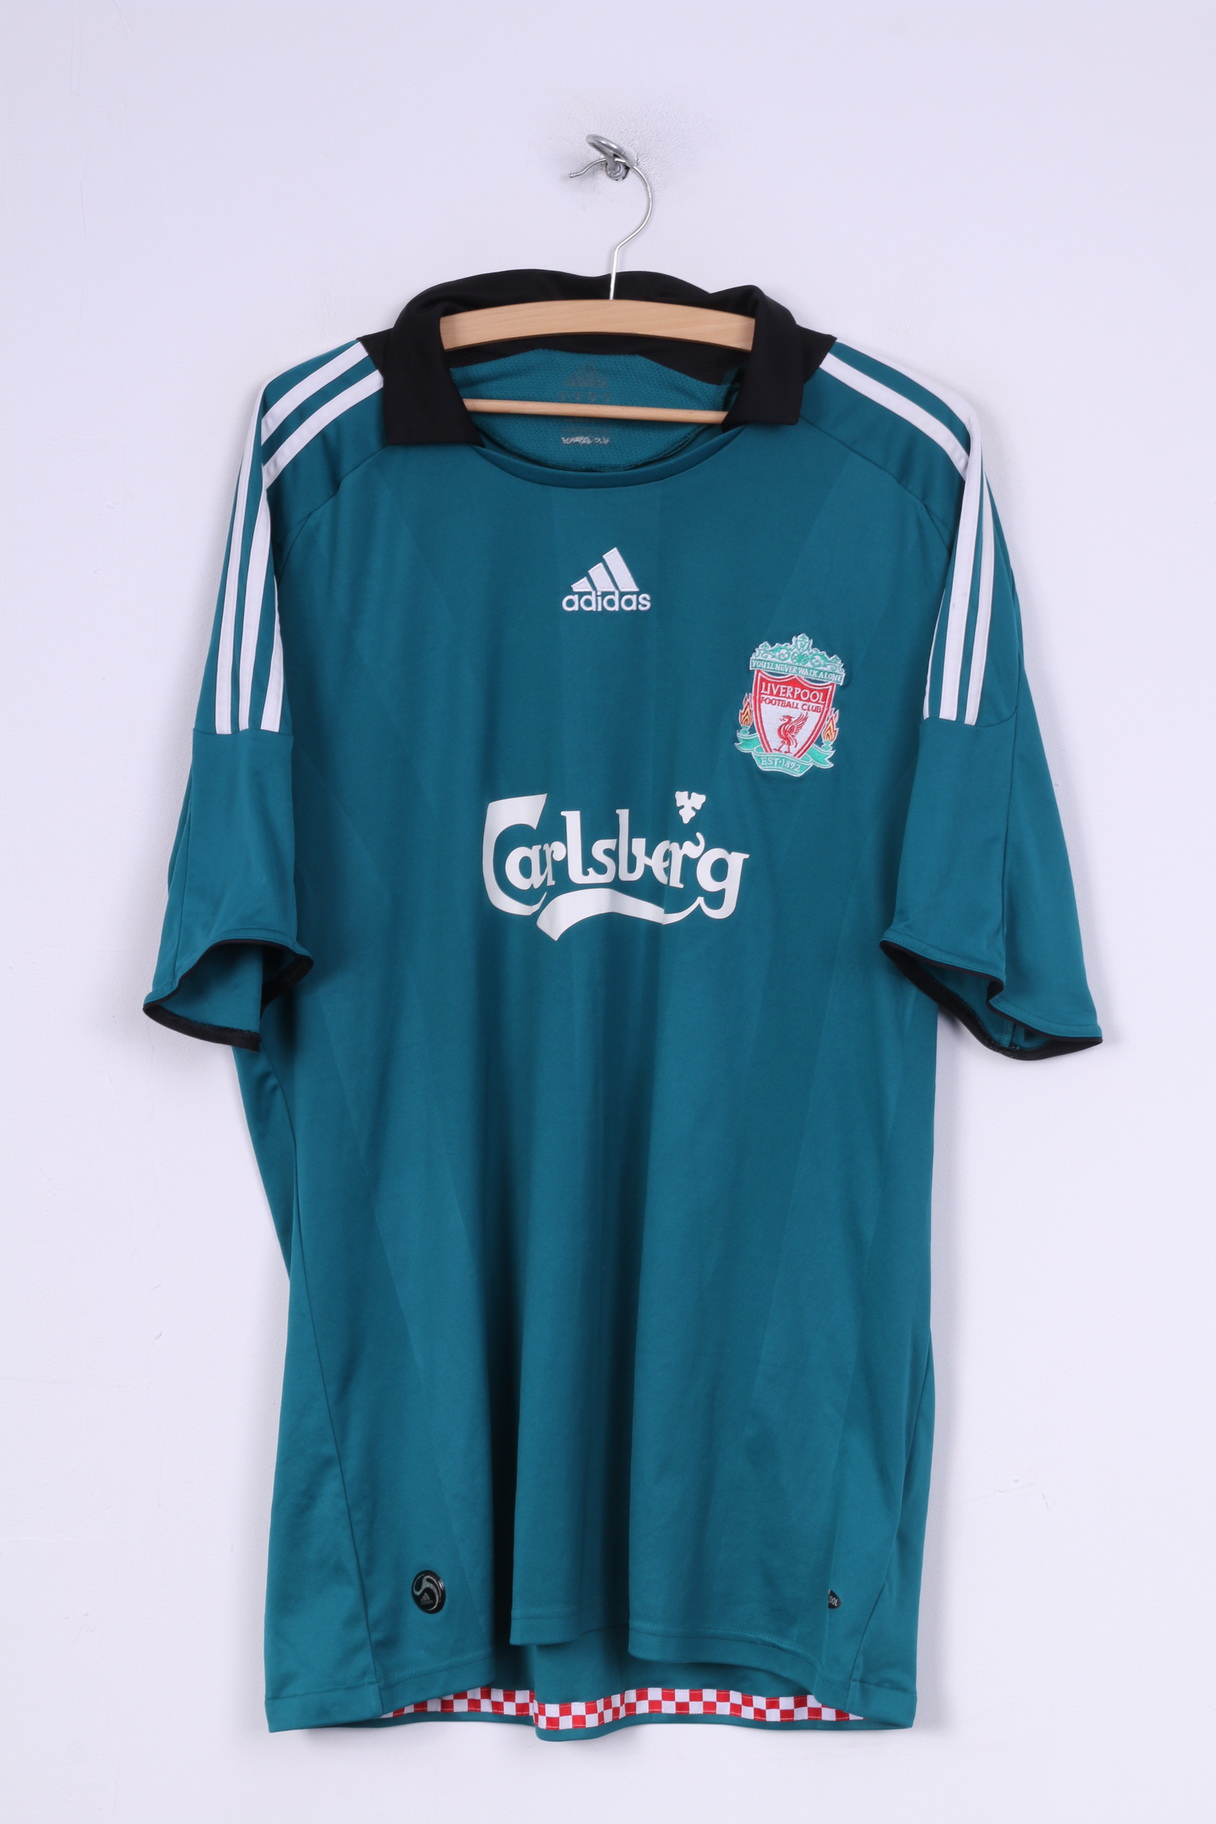 add0a5c11 Liverpool Football Club Polo Shirts - Nils Stucki Kieferorthopäde